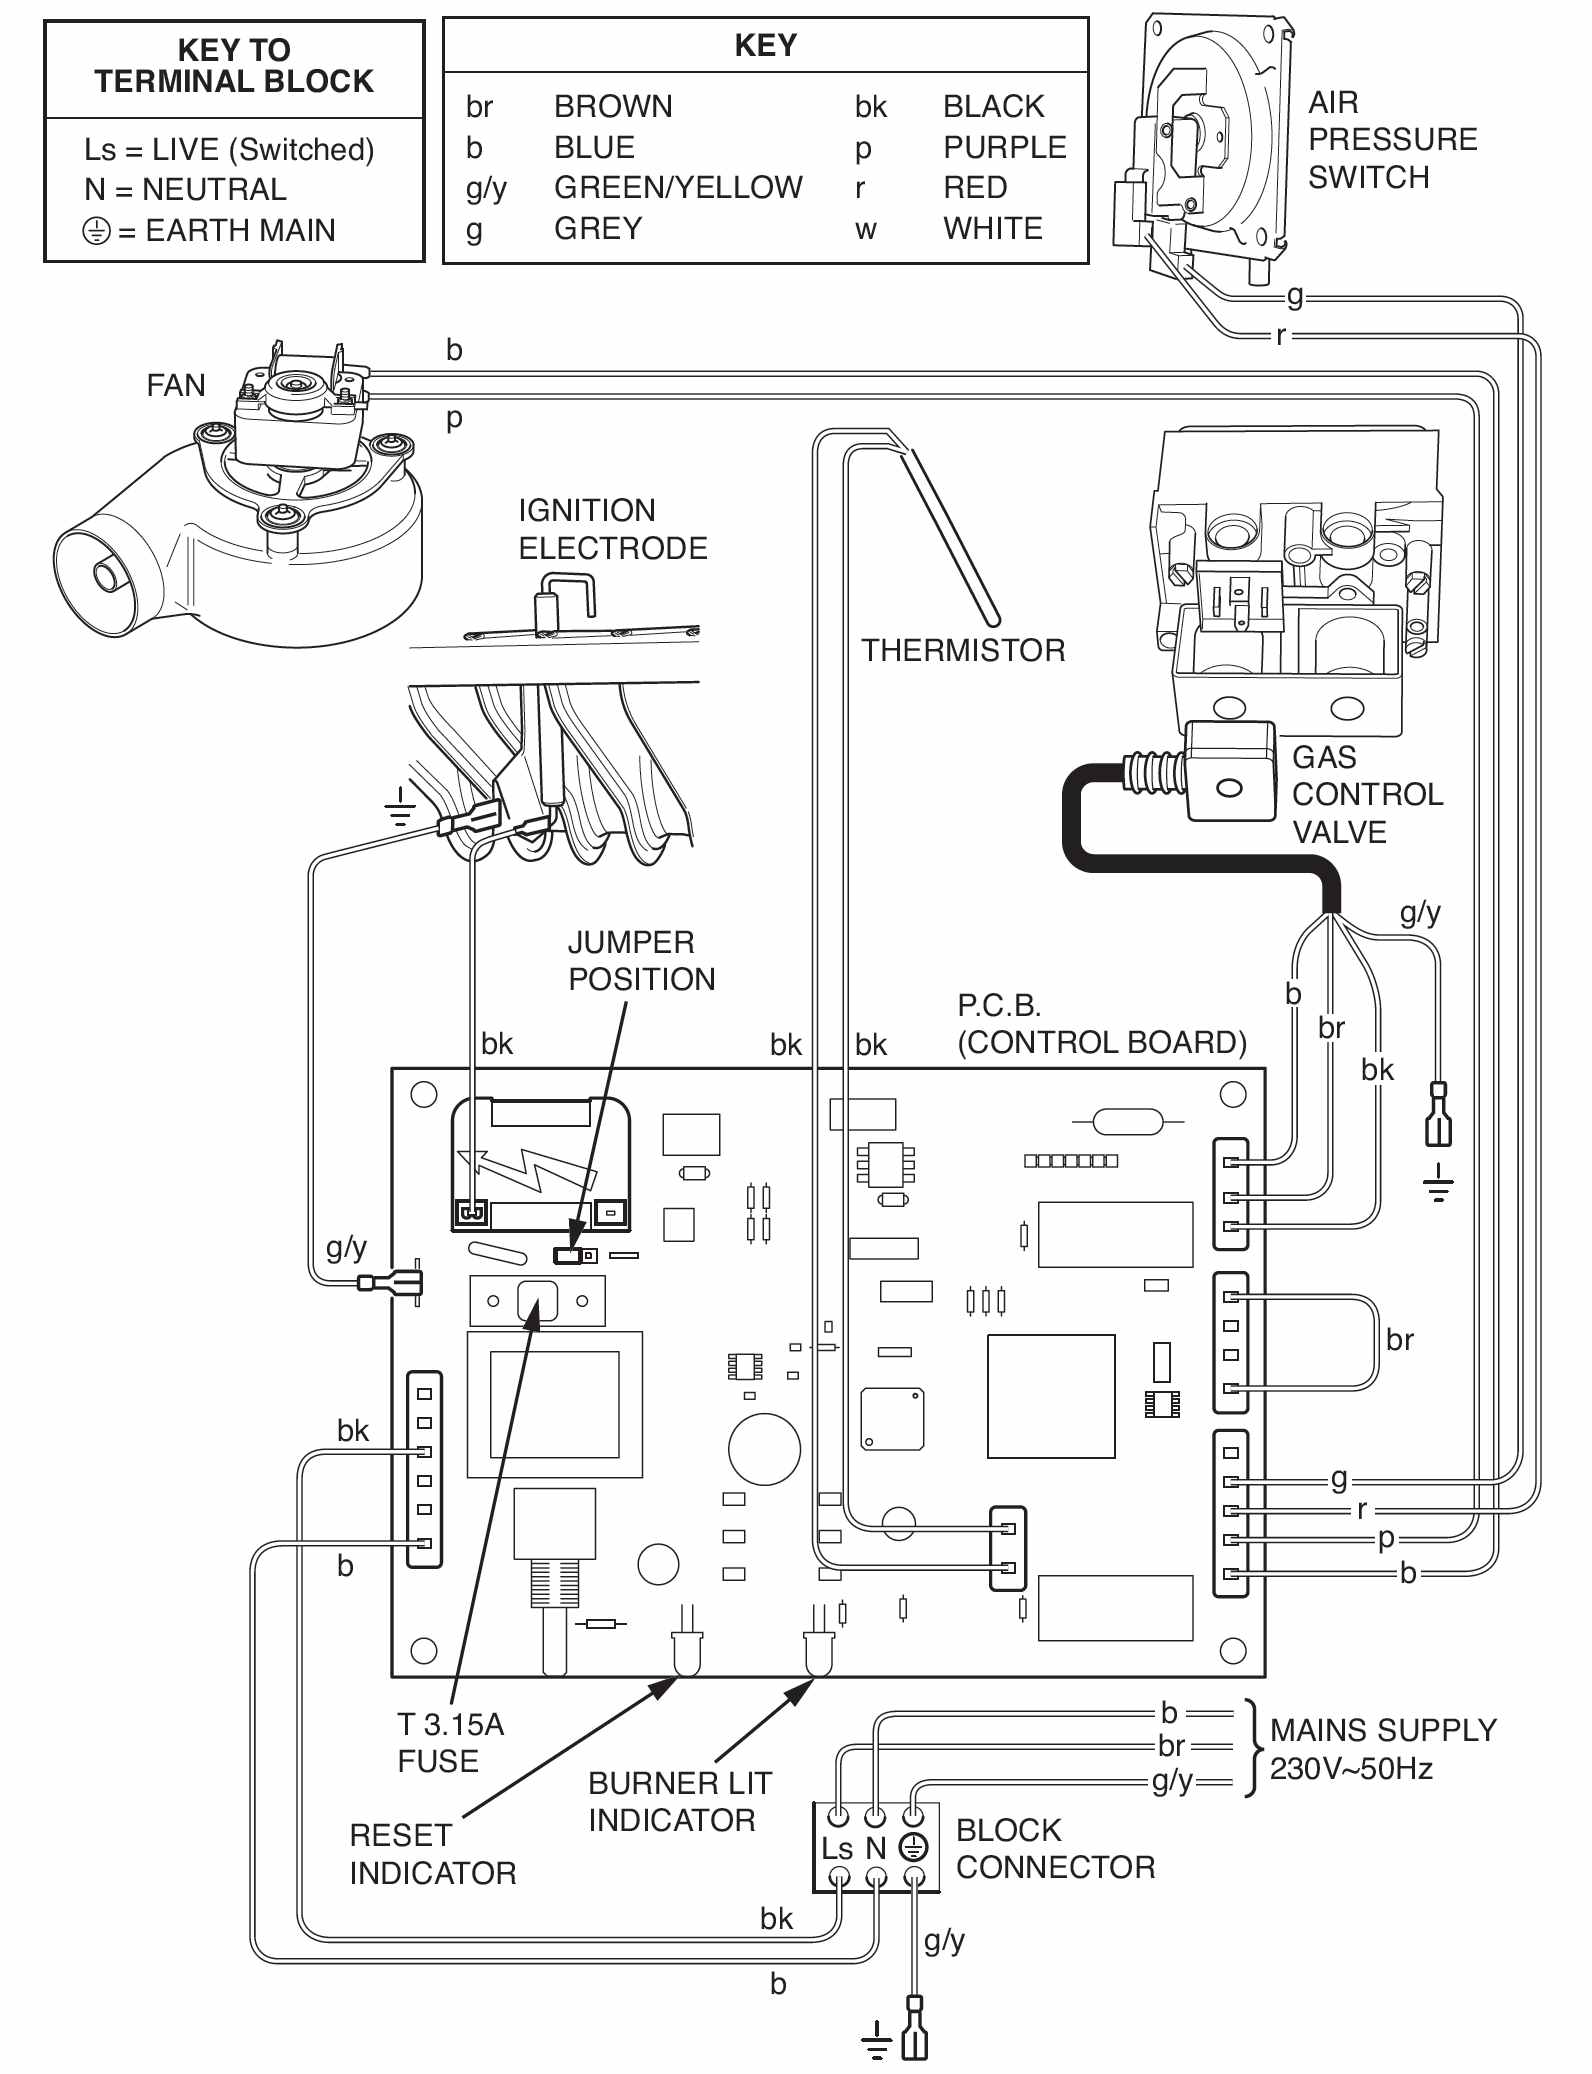 hight resolution of  hideaway 40bff 60bff 80bff schematic wiring diagram pijnenburg ritter pcb versions